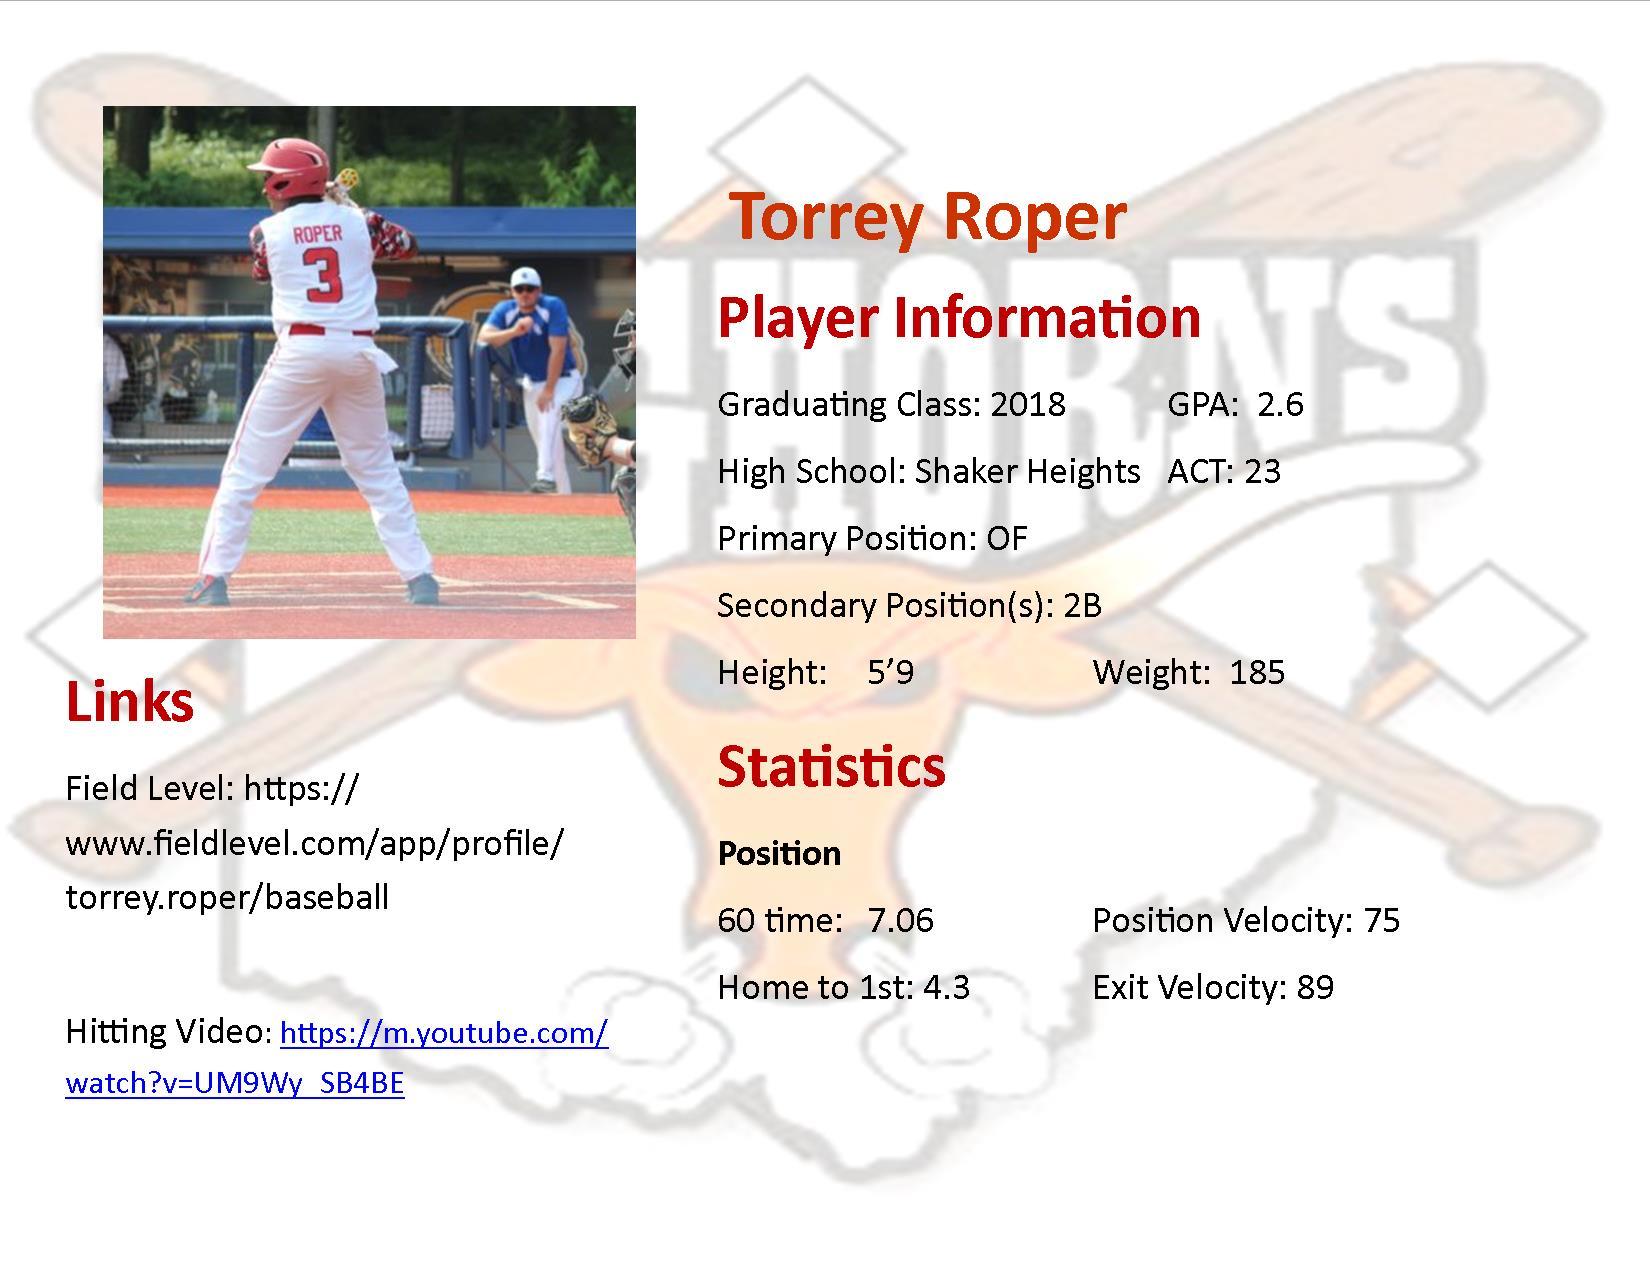 Torrey Roper